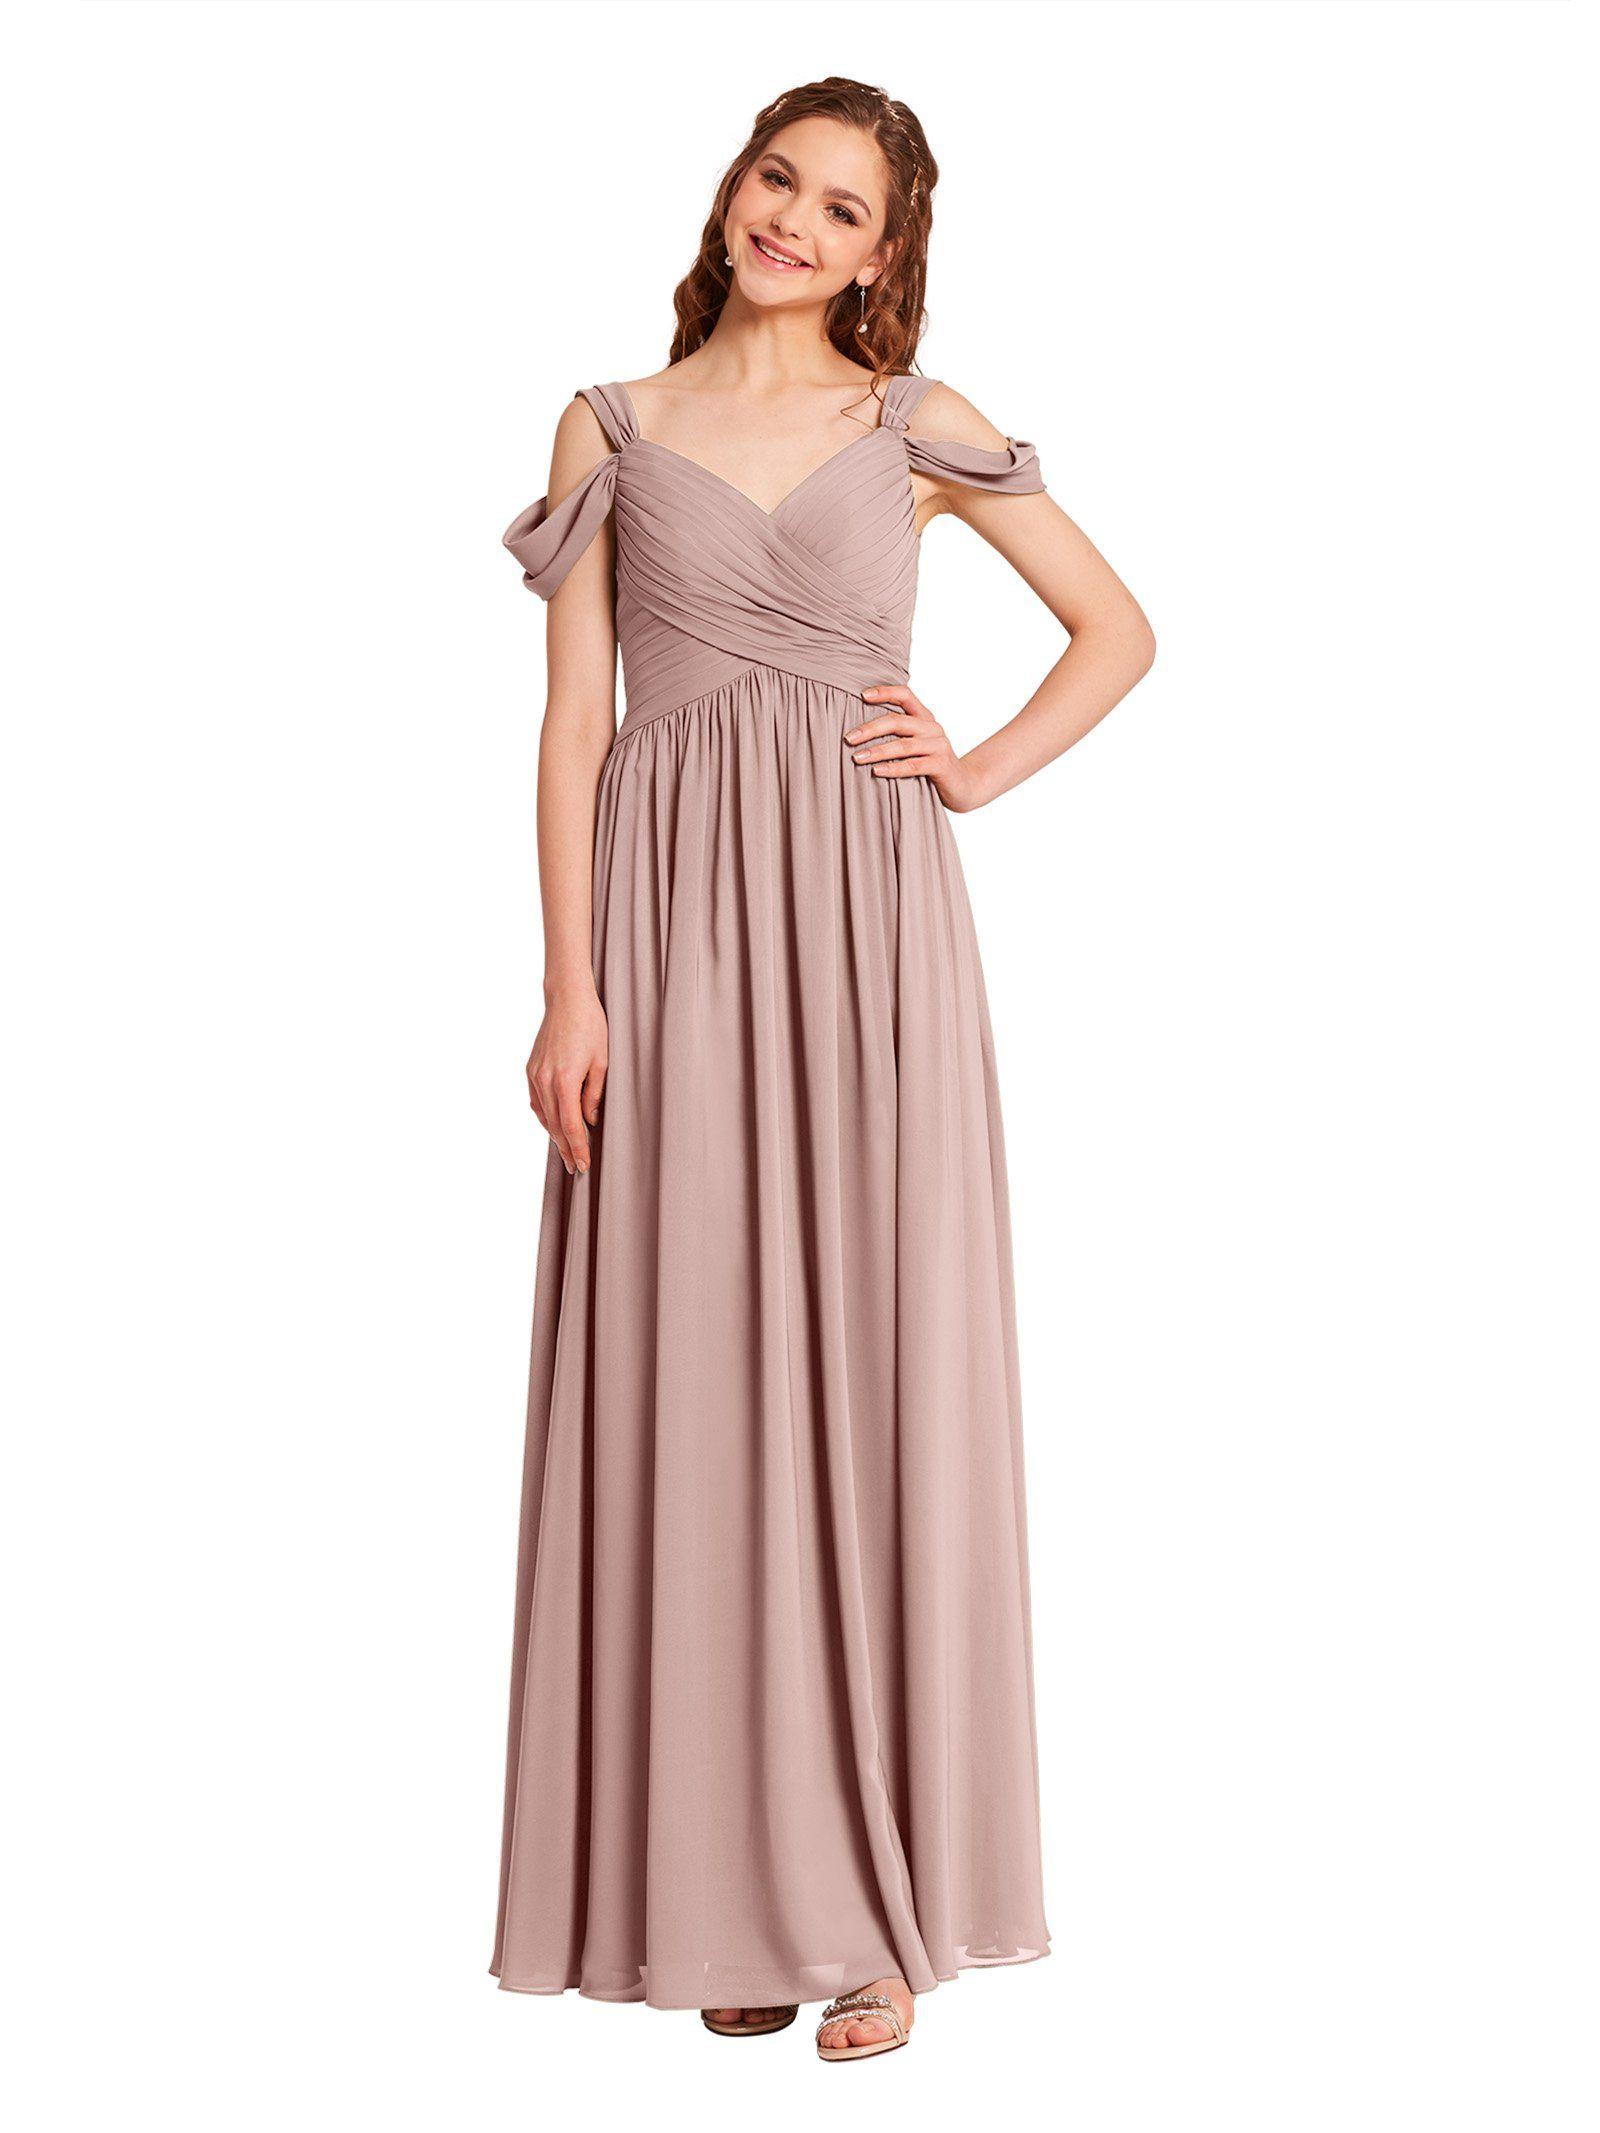 d1fe4173f10b4 Alicepub VNeck Chiffon Bridesmaid Dress For Women Formal Evening ...